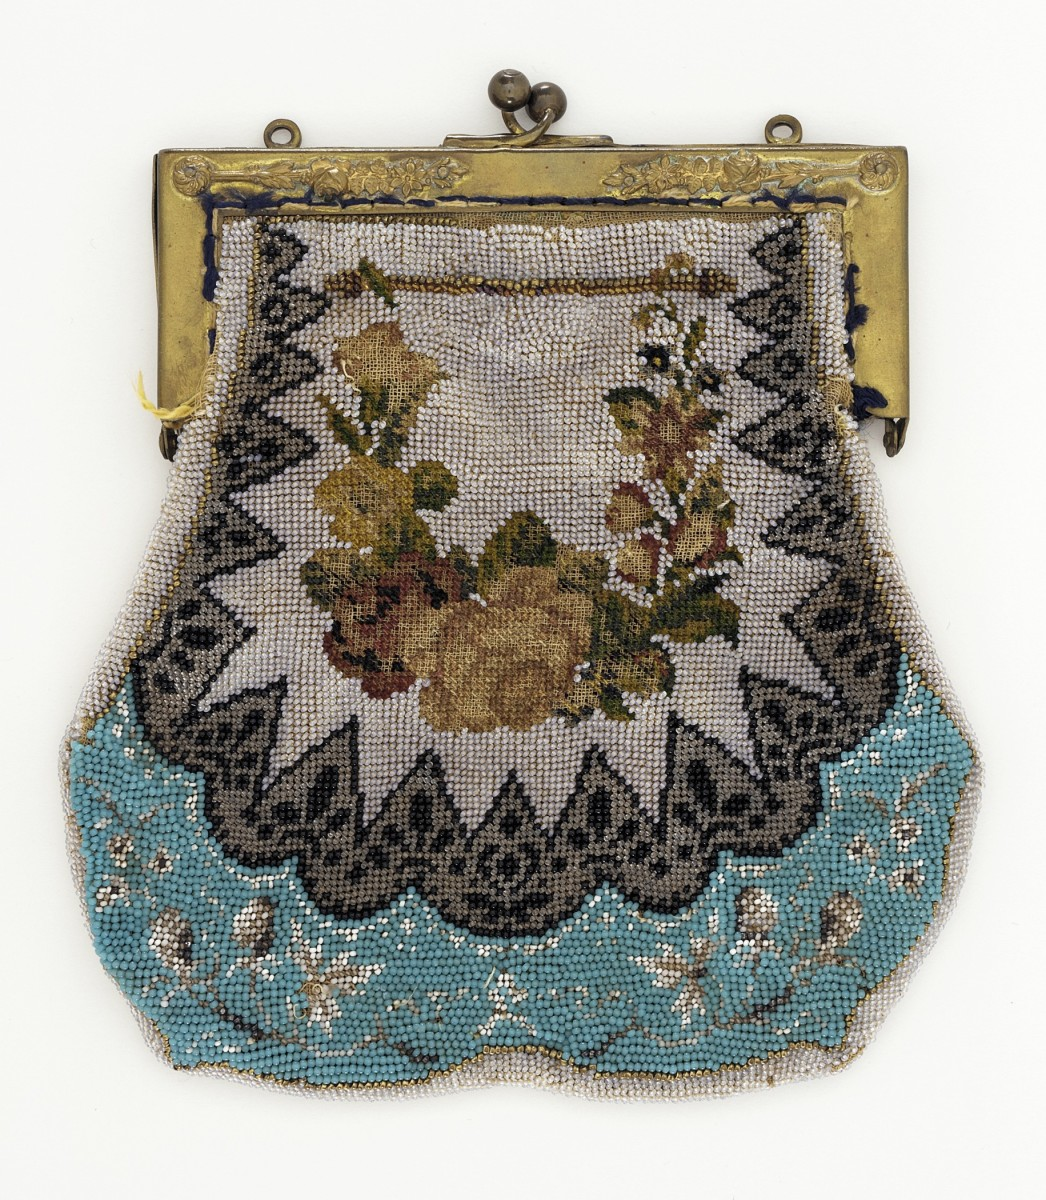 Woman's handbag 1860